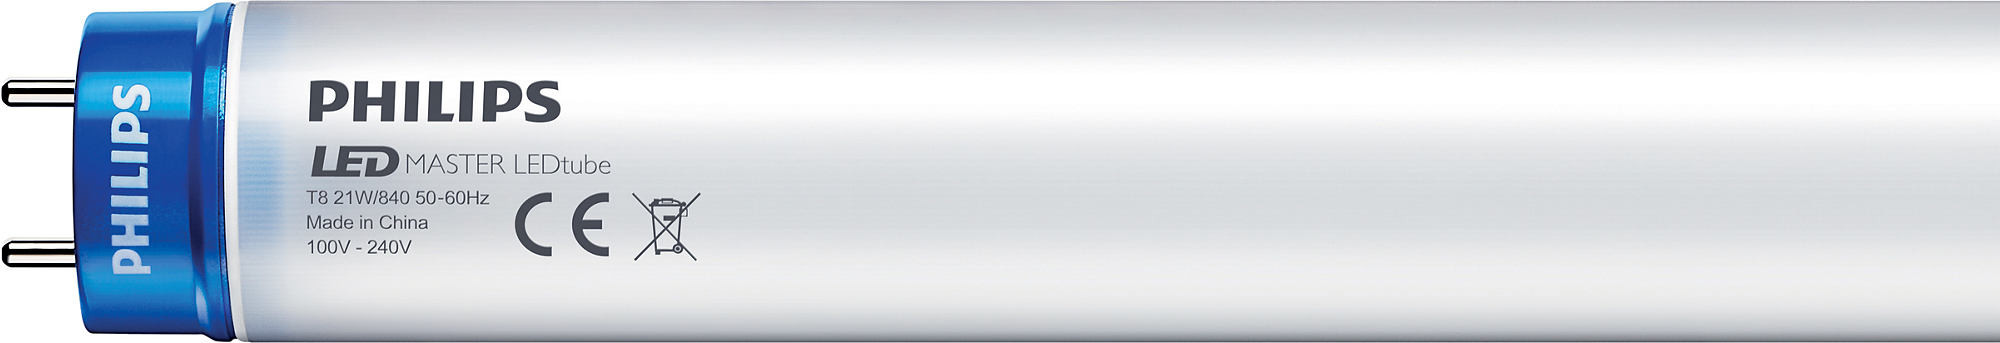 Philips MASTER LEDtube PERF 600mm 10.5W 865 T8 C